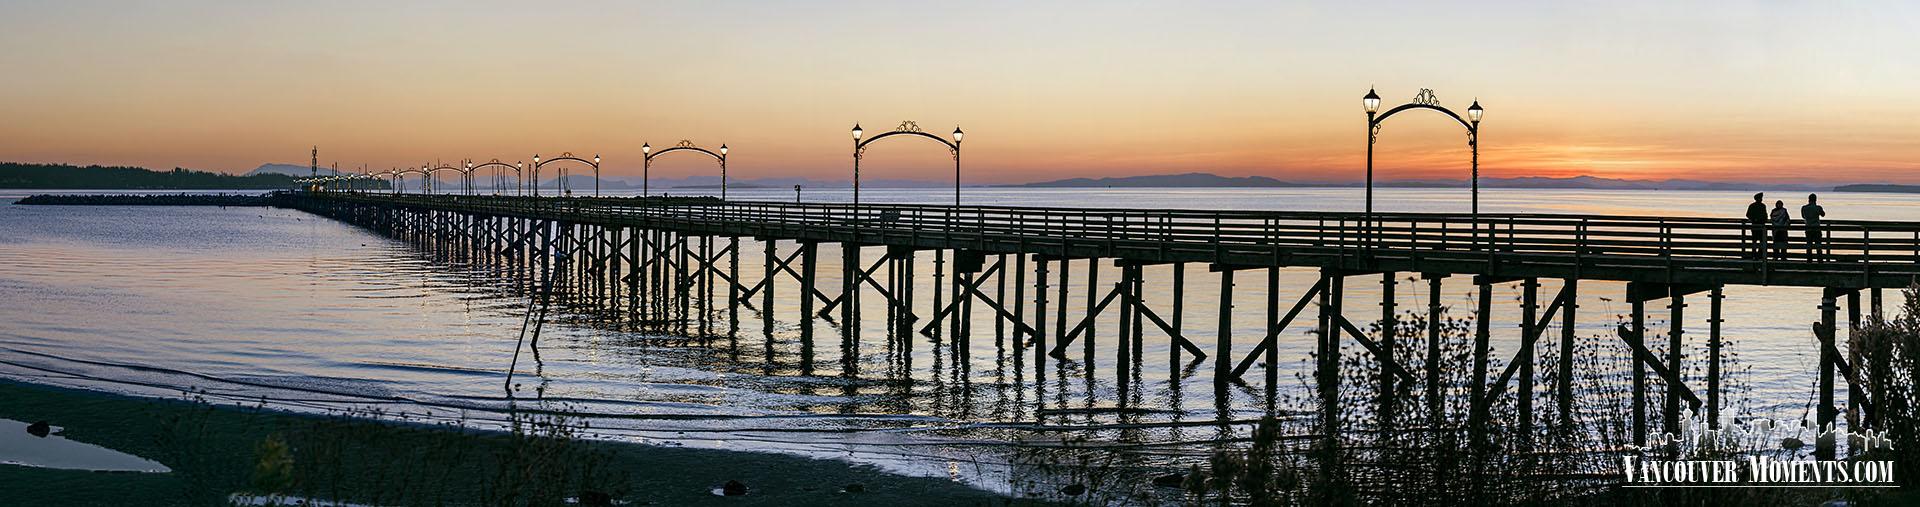 White_Rock_Pier_Sunset_WS227A1